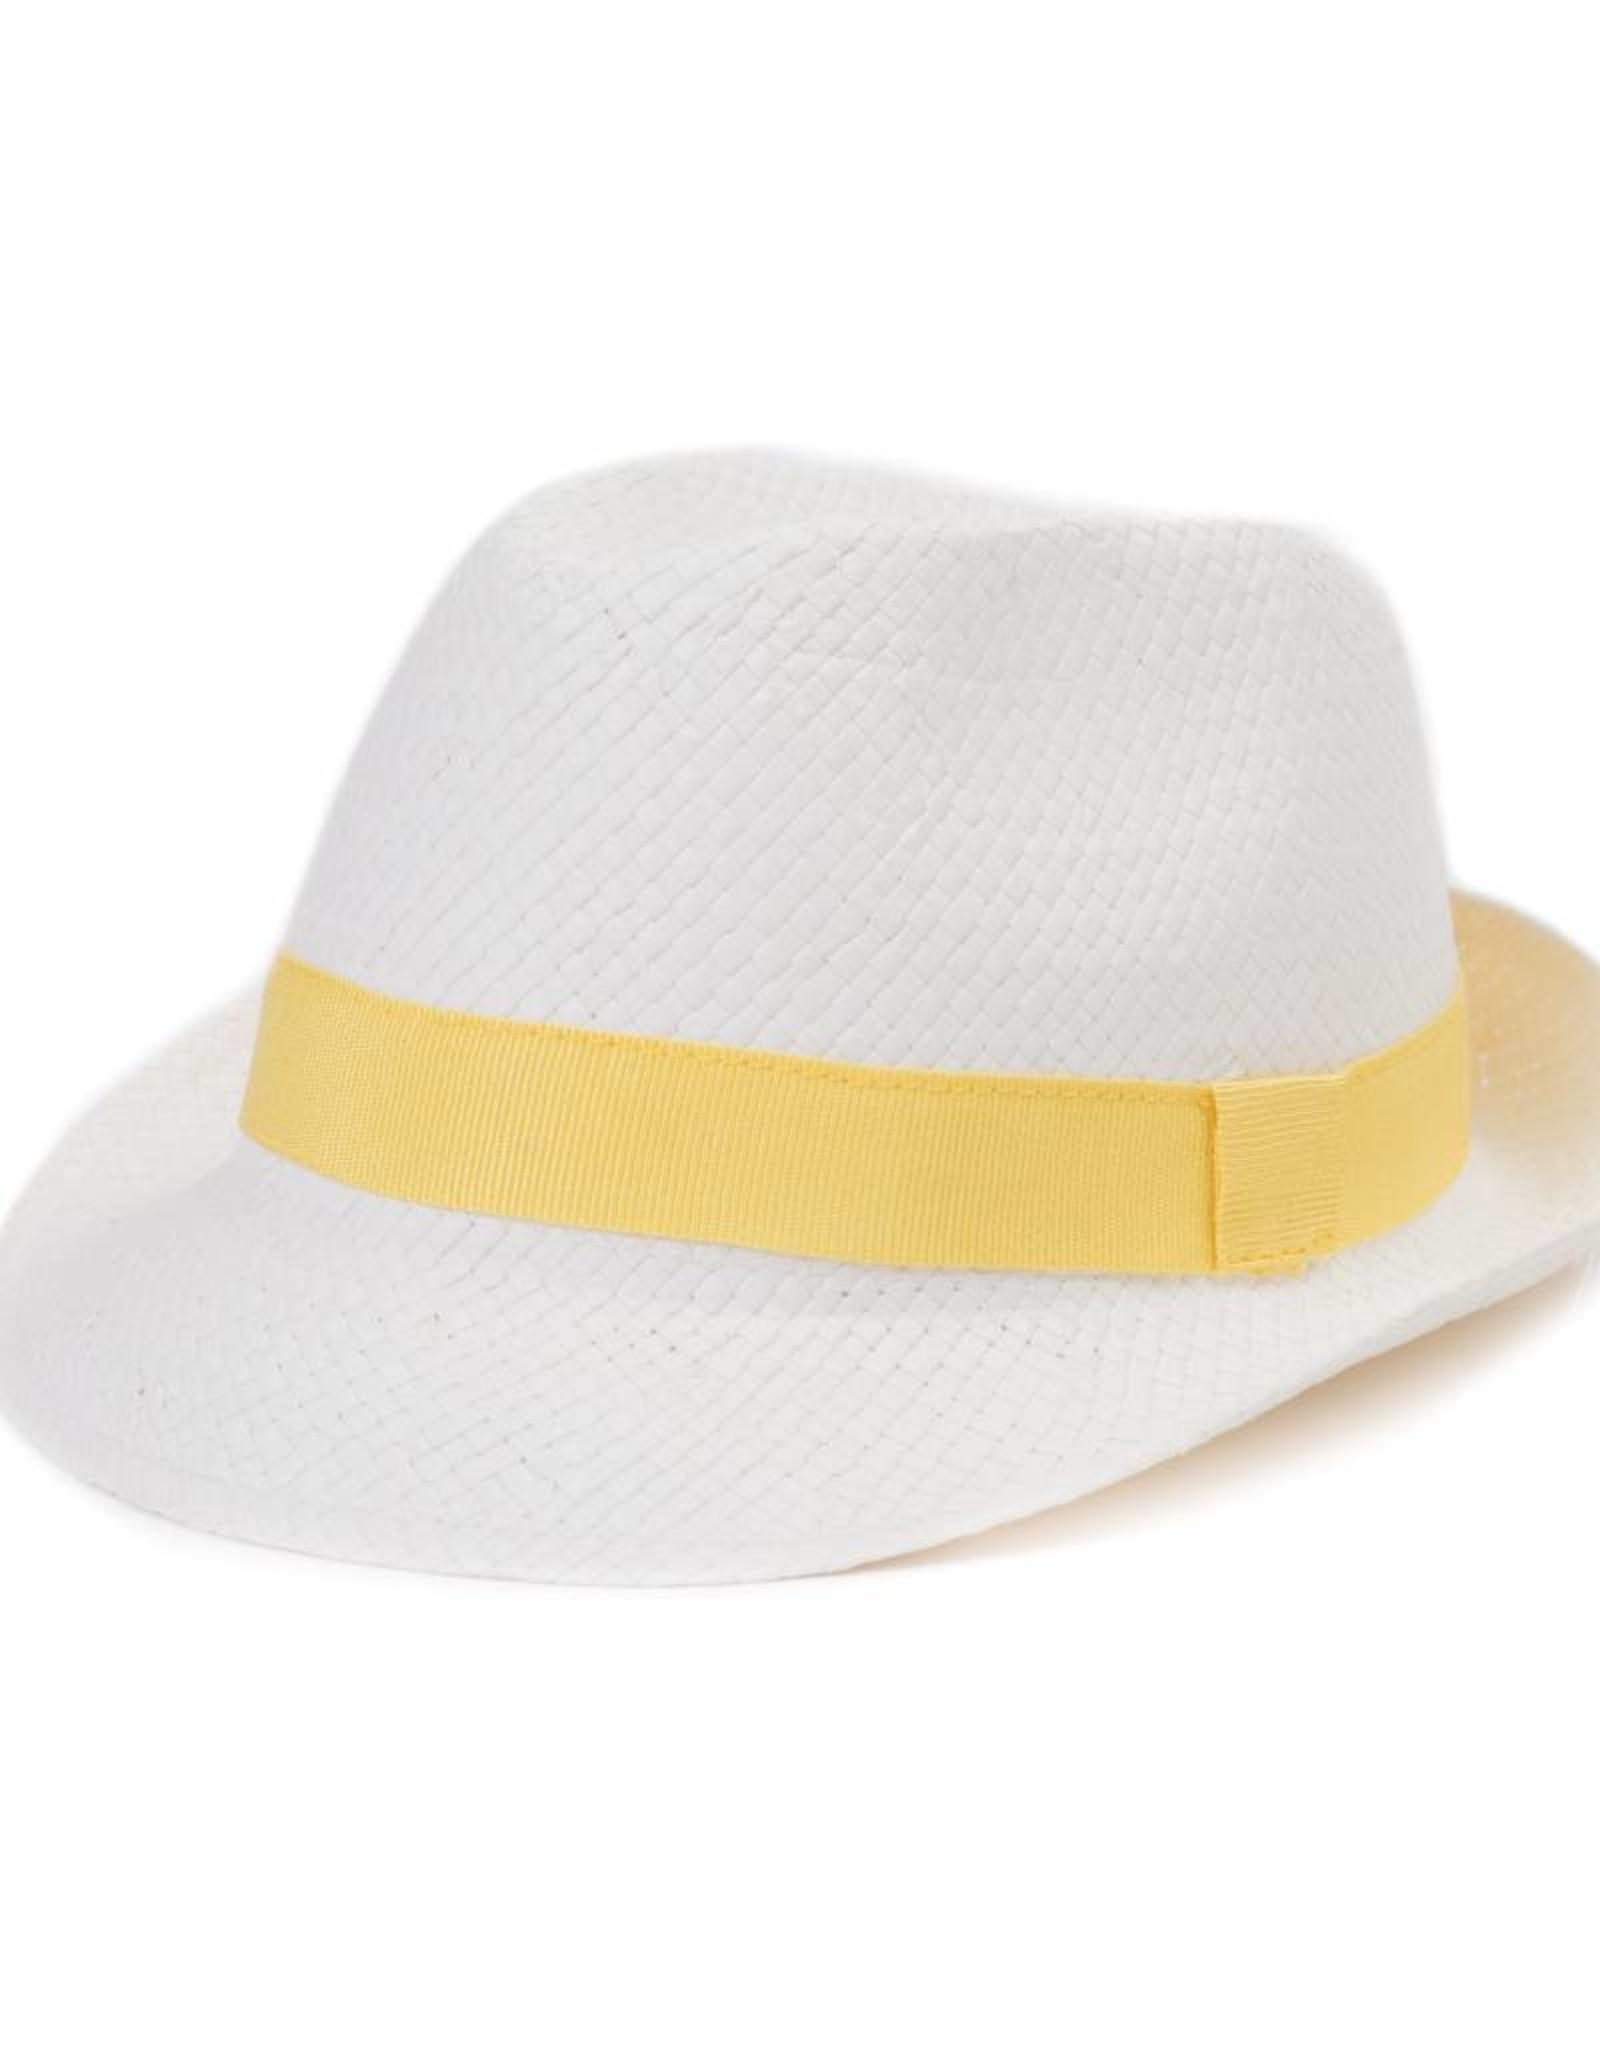 Bonton Chapeau Gros grain